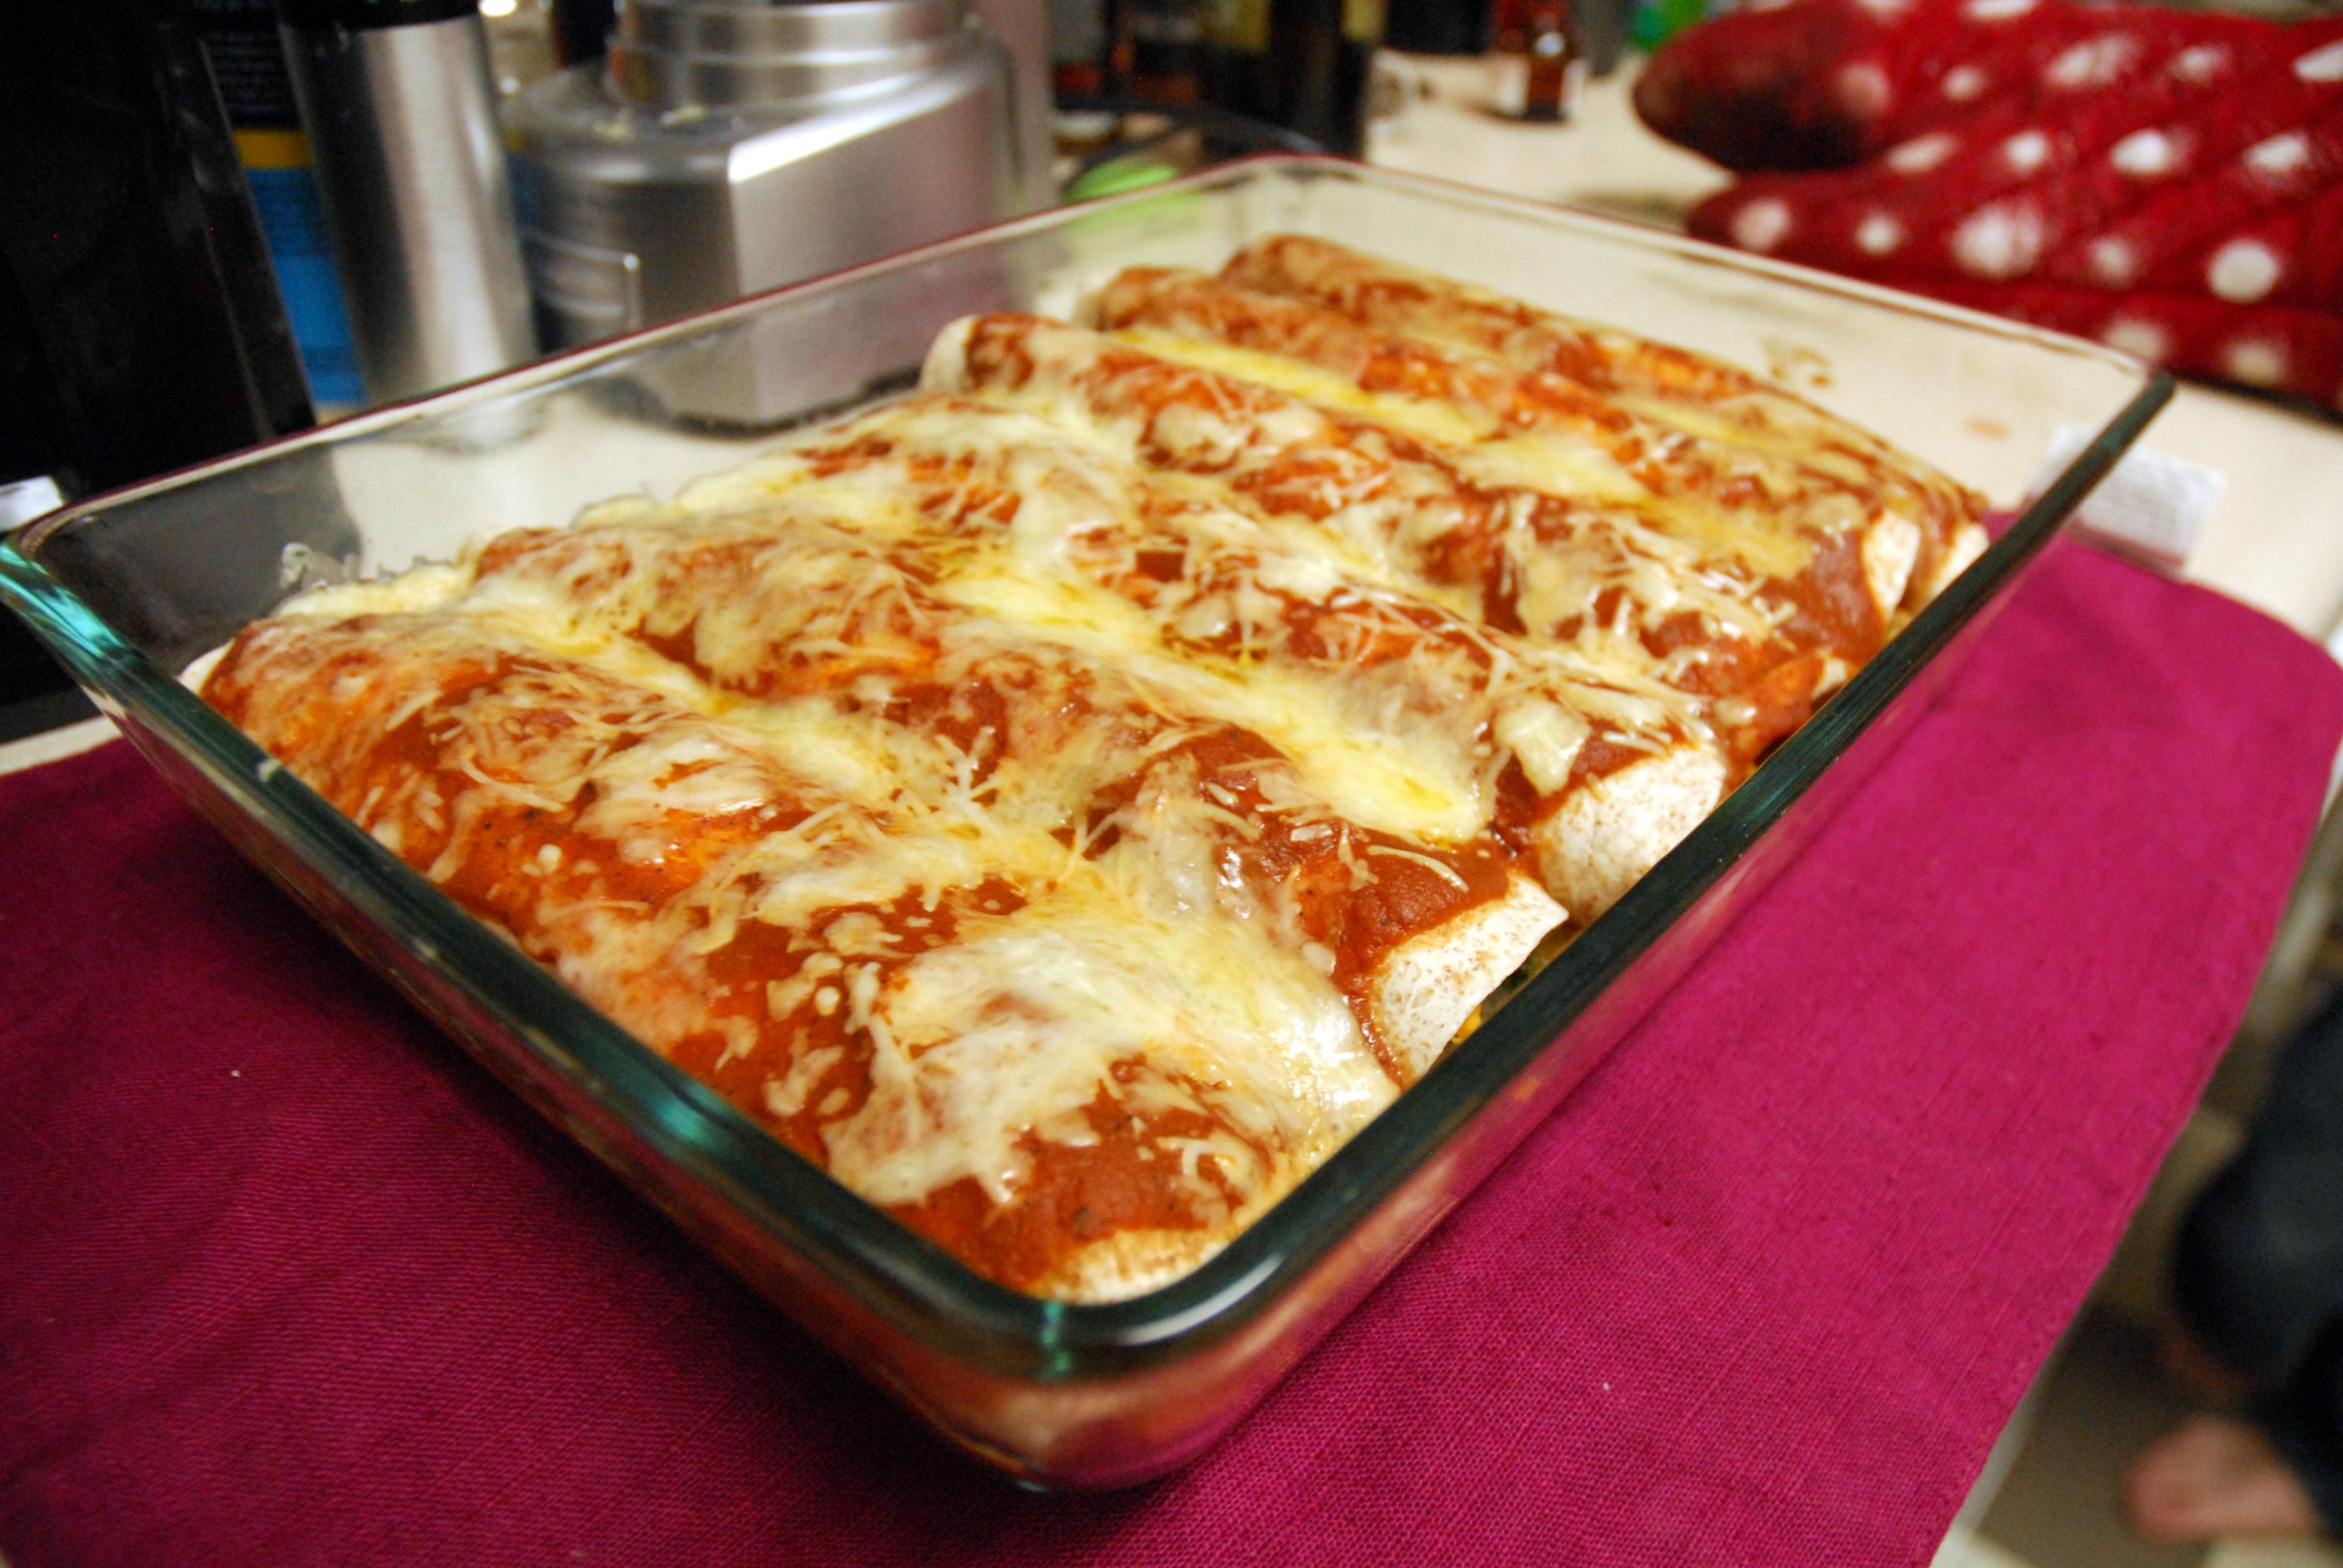 ... tasty sweet potato enchiladas. With homemade enchilada sauce